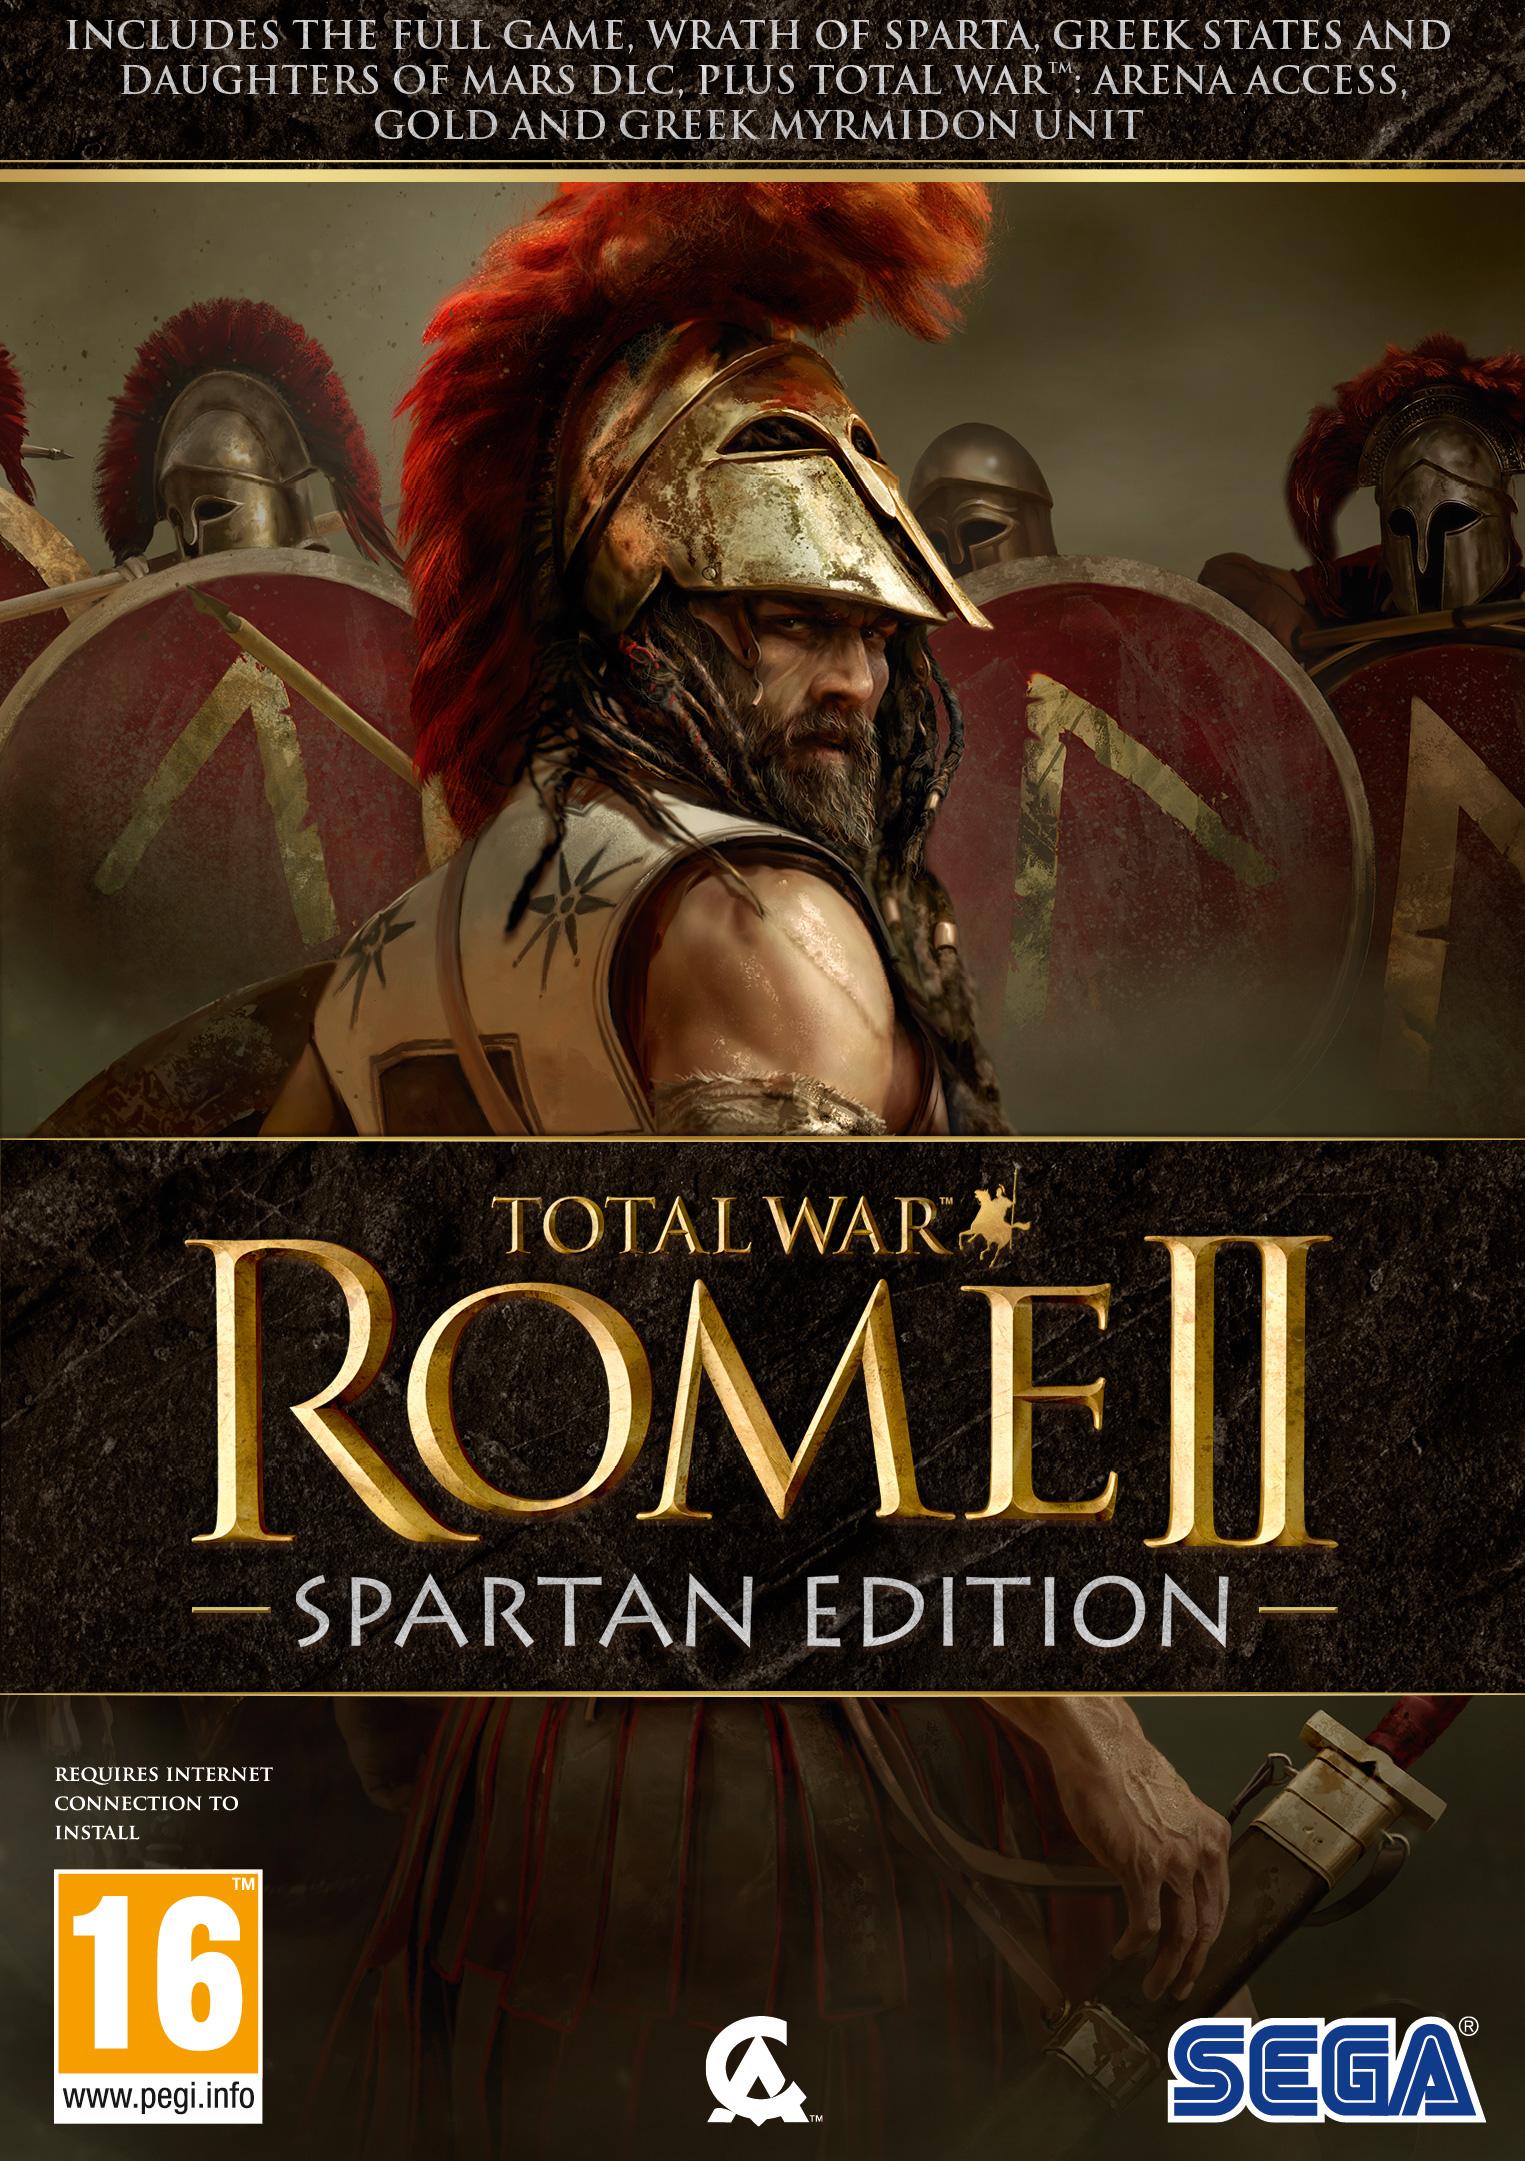 Total War: Rome II (2) - Spartan Edition